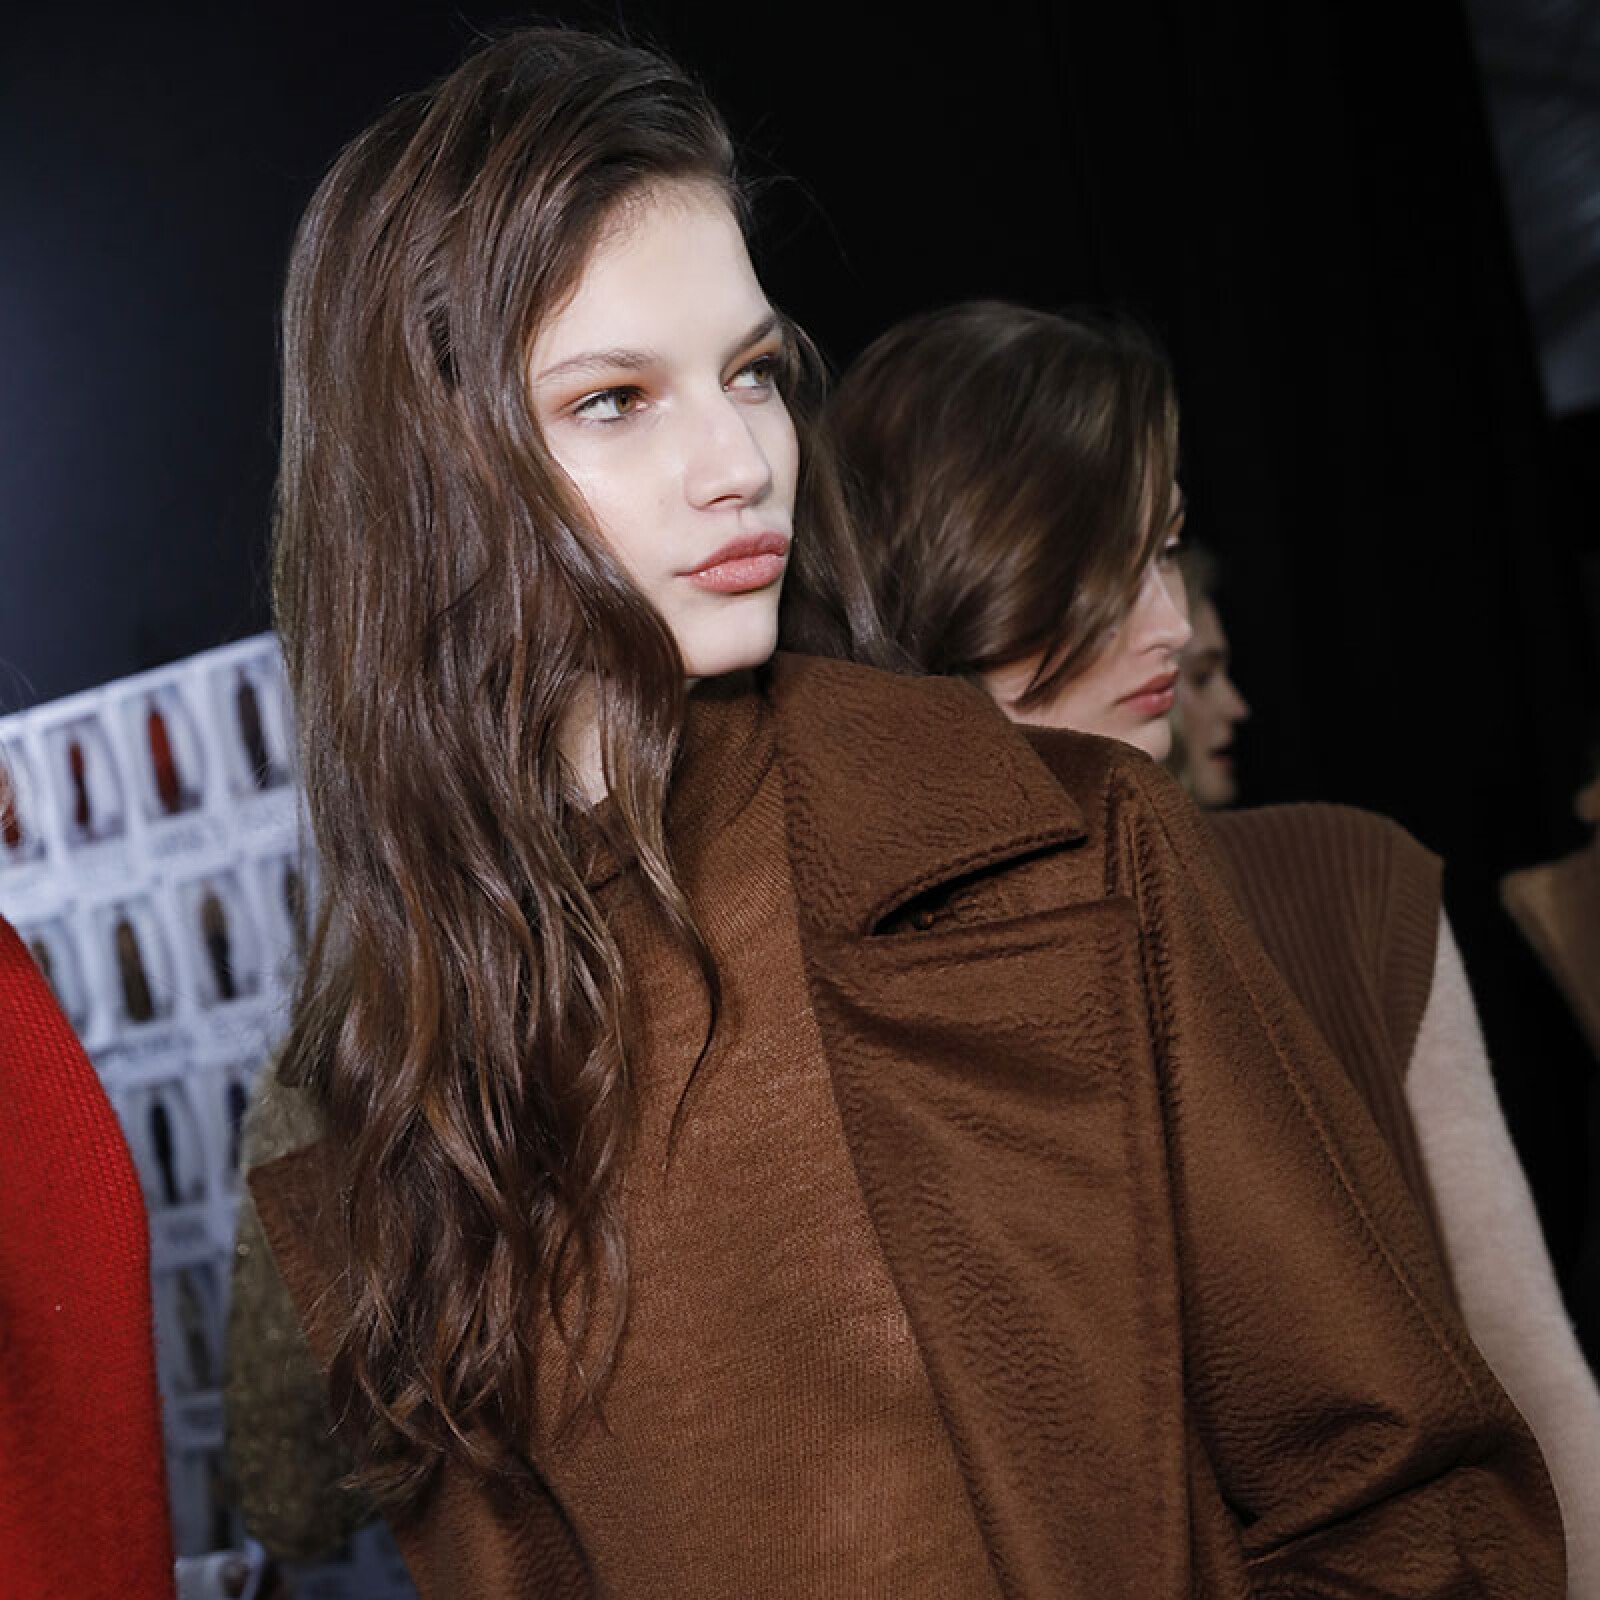 Max Mara - Backstage - Milan Fashion Week Fall/Winter 2017/18